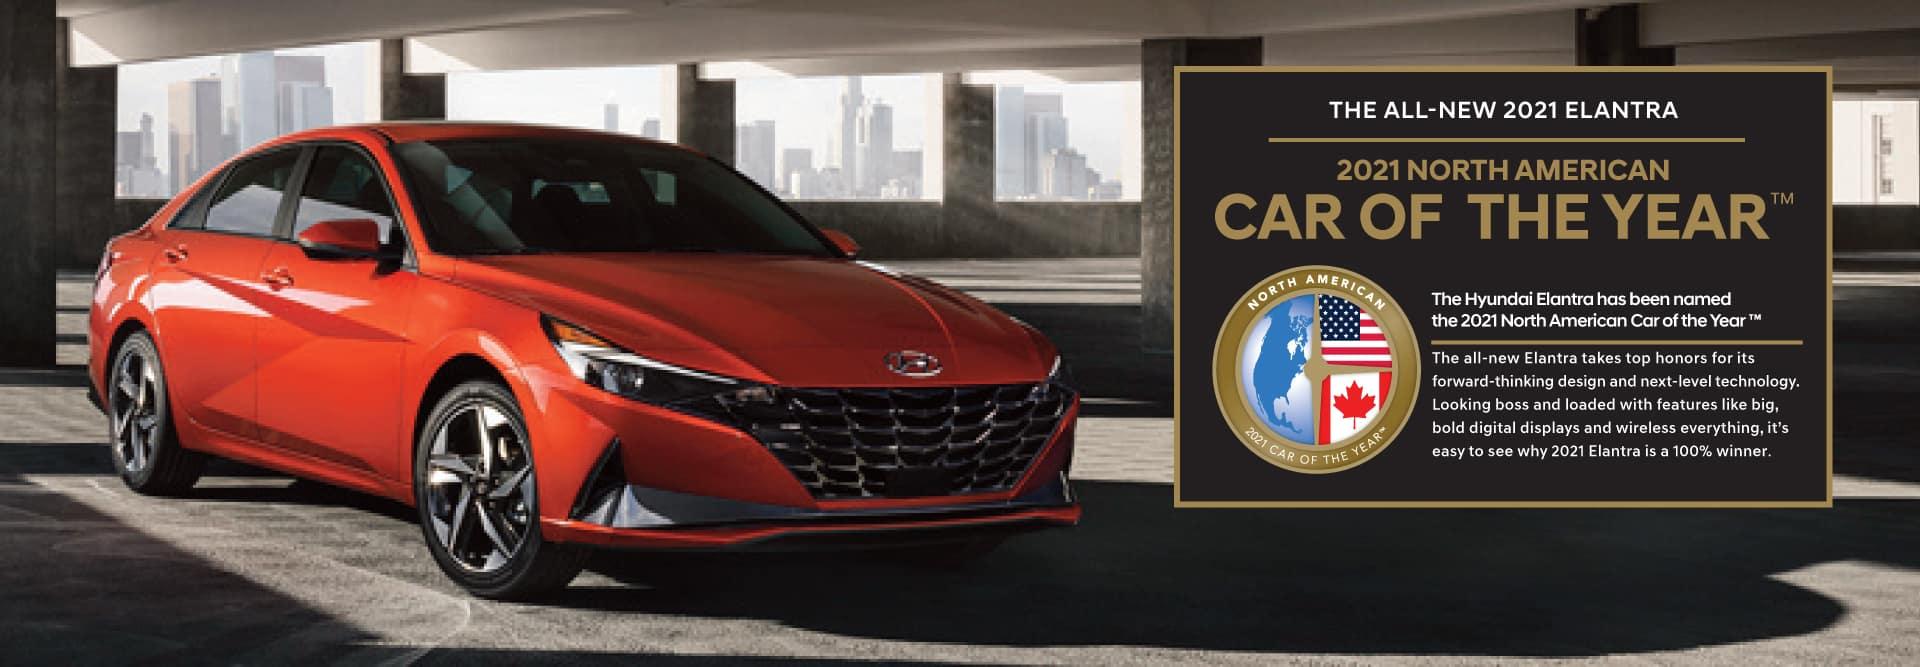 2021-january-elantra-car-of-year